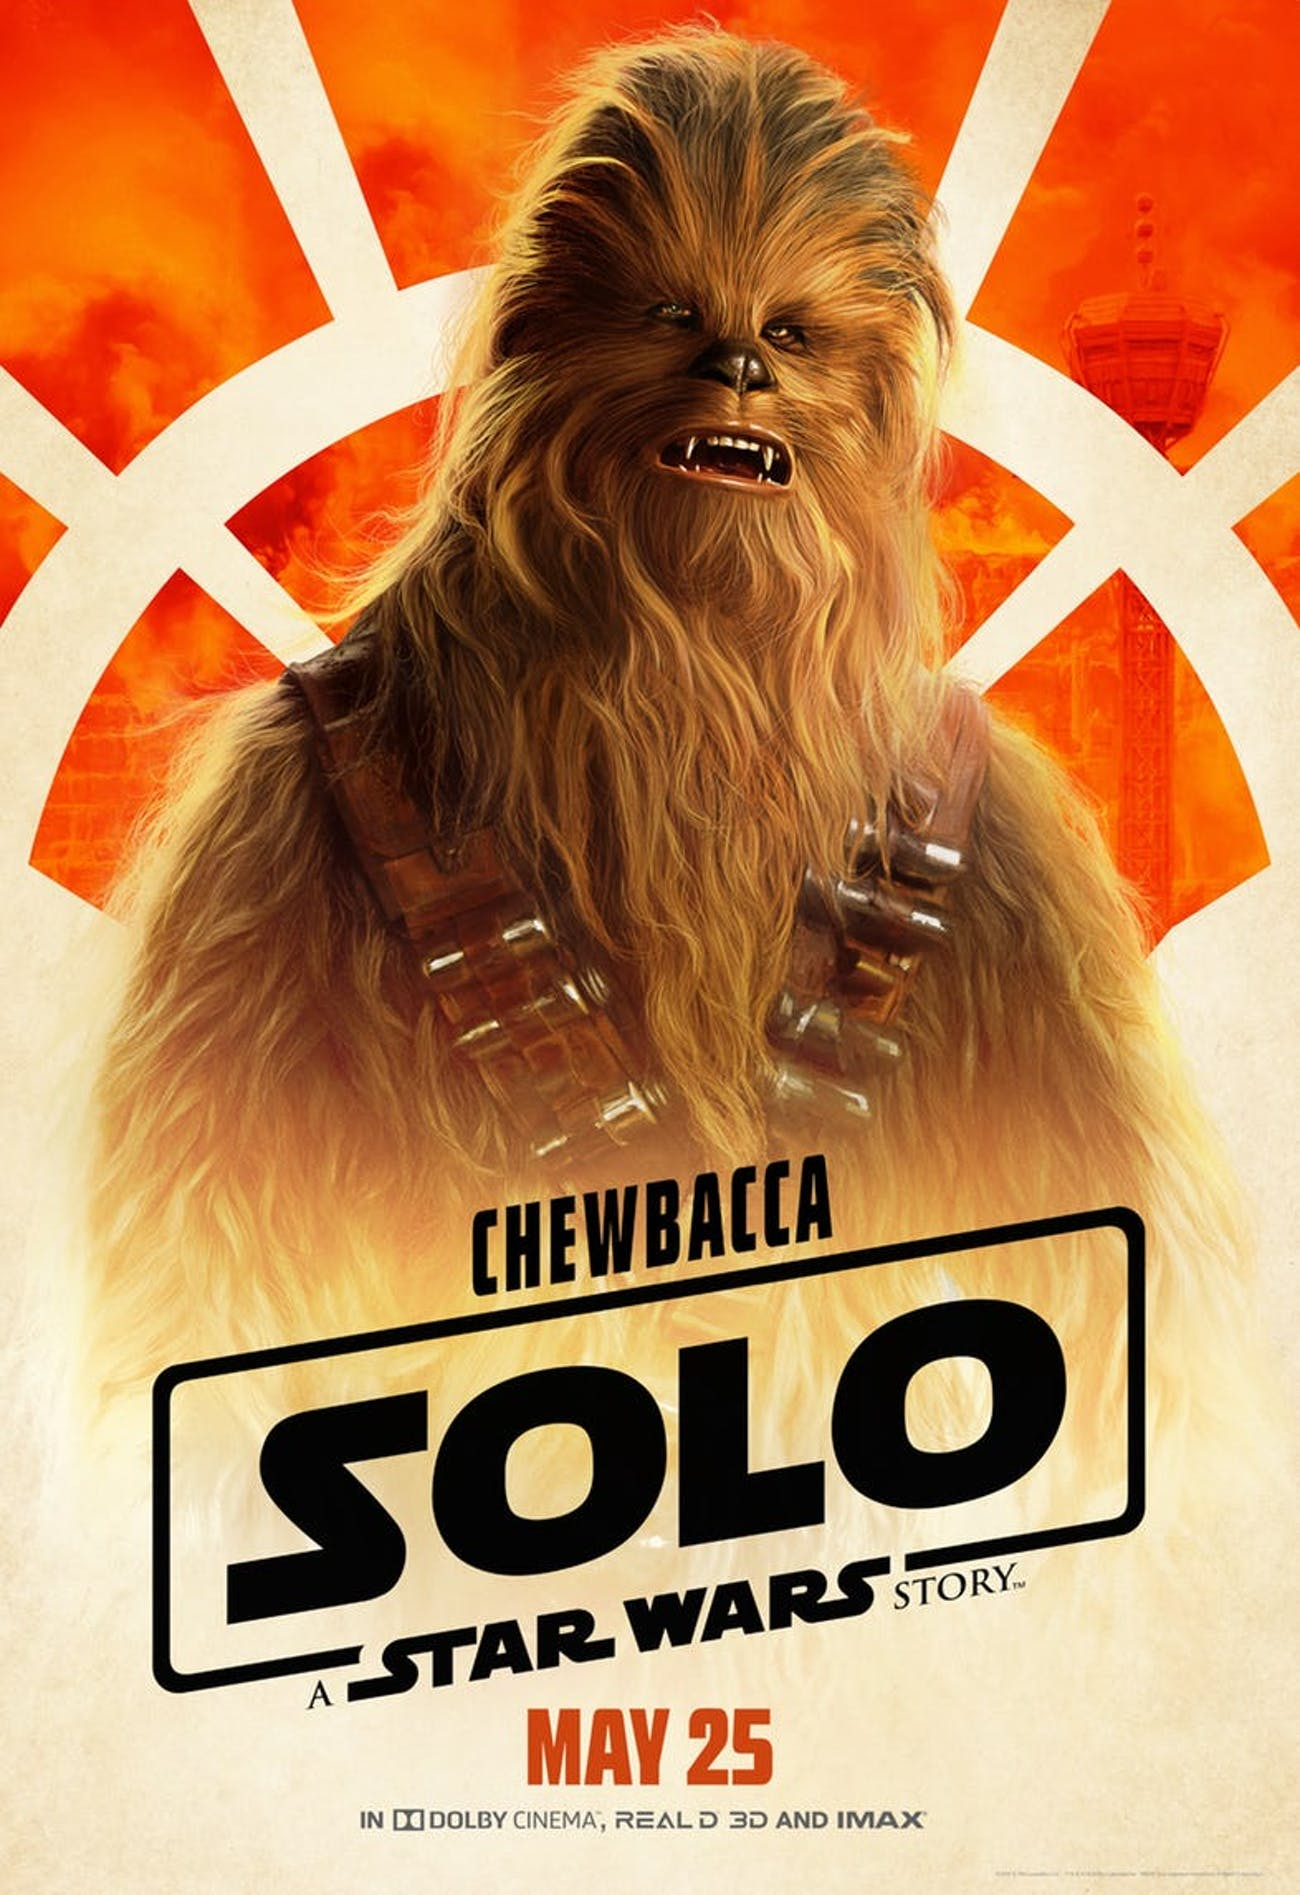 Joonas Suotamo as Chewbacca in 'Solo: A Star Wars Story'.